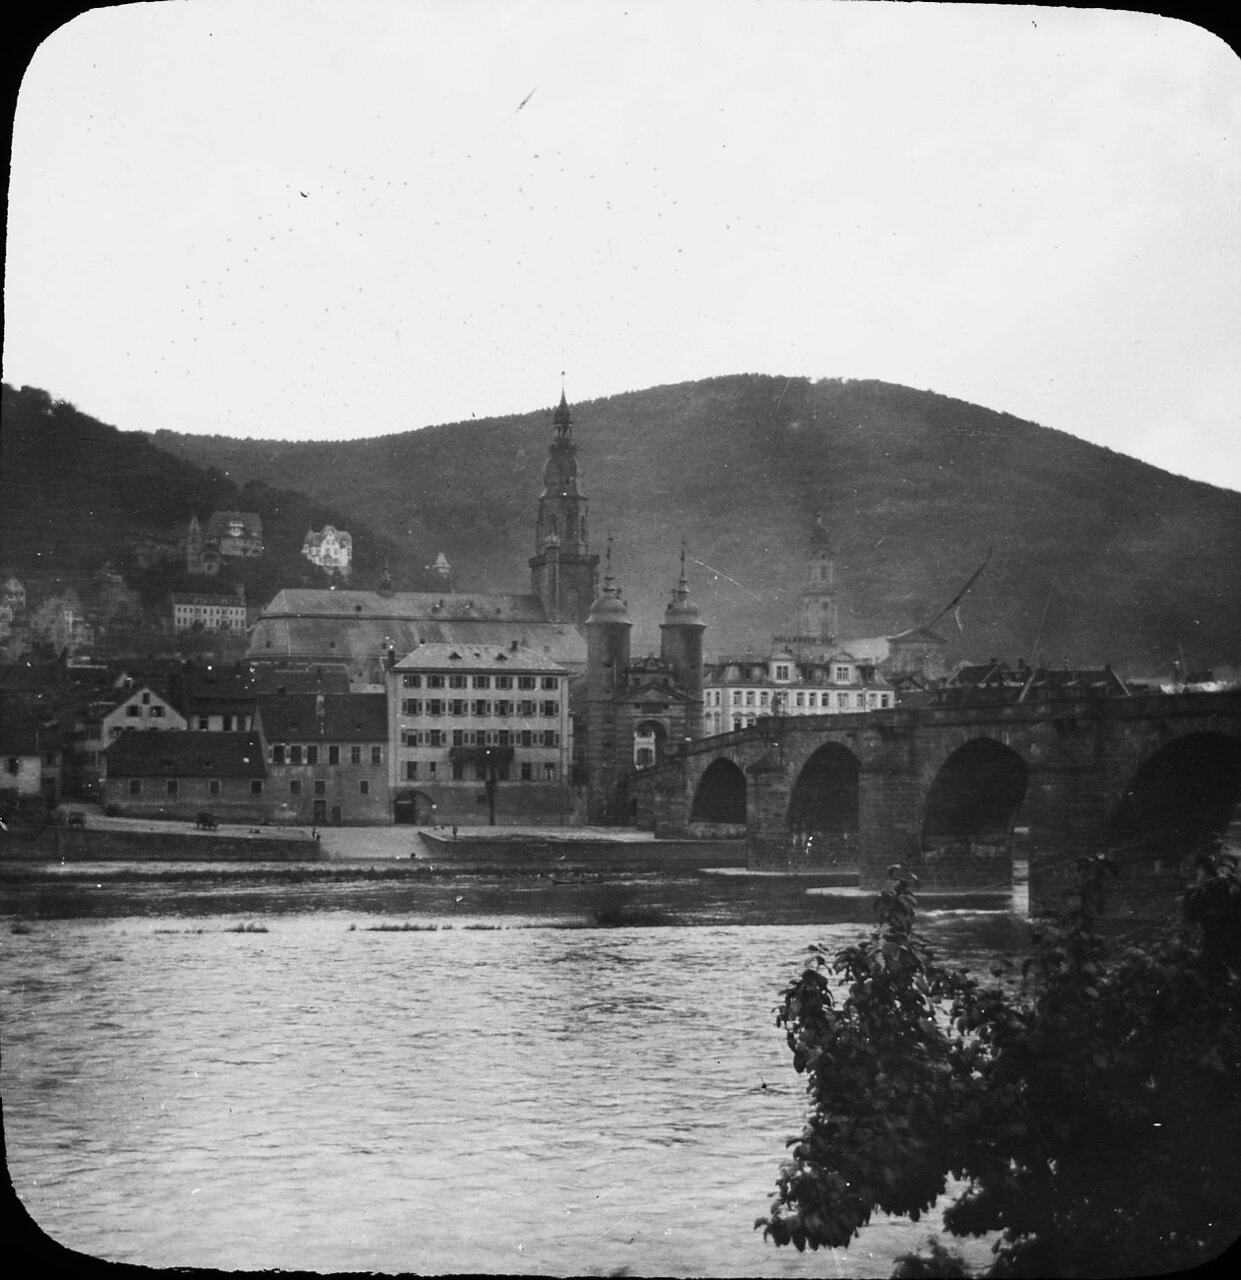 Гейдельберг. Мост Карла-Теодора через реку Неккар, 1906